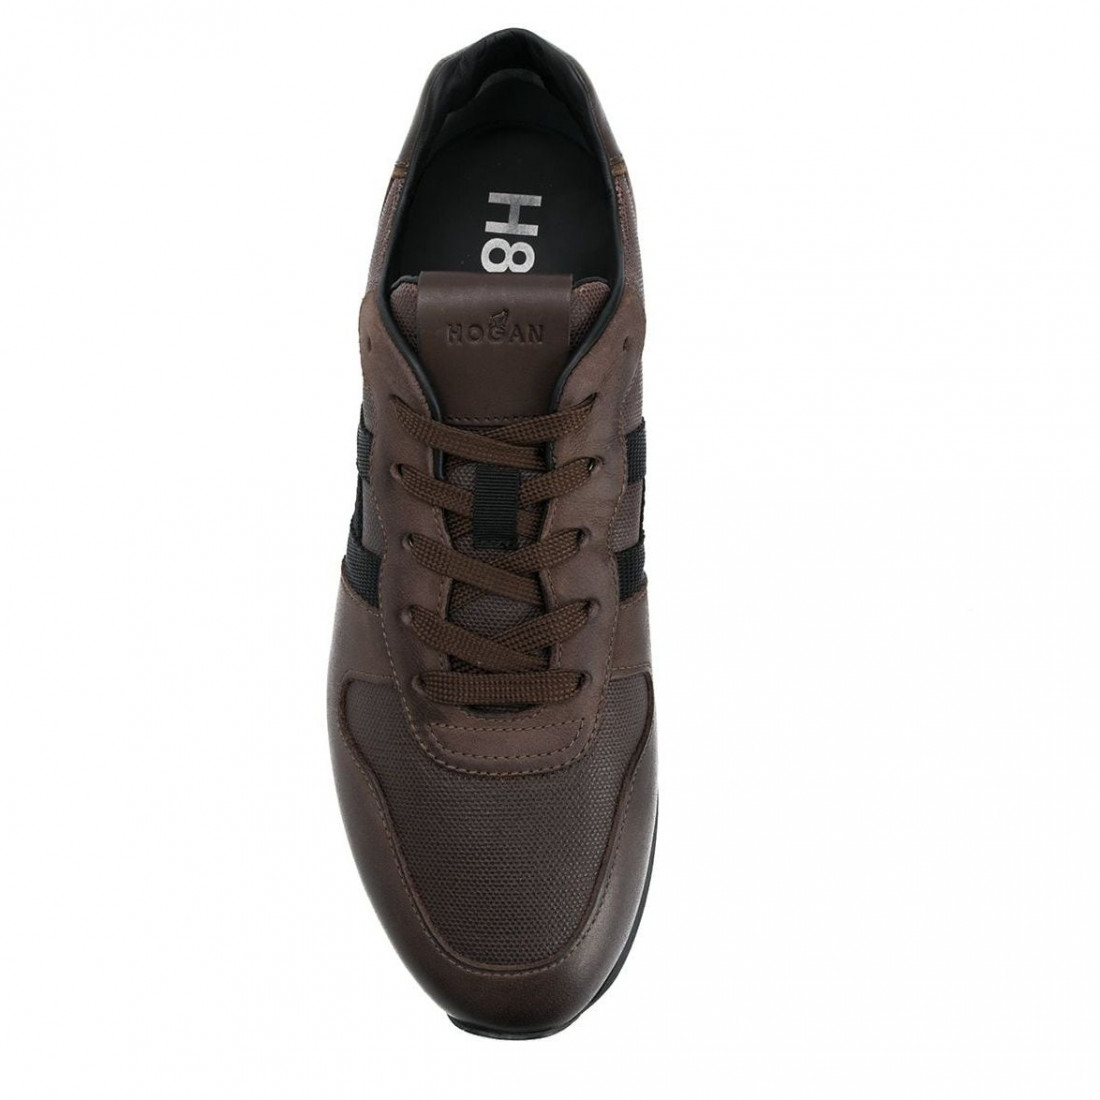 sneakers uomo hogan hxm4290cz62oef65nh 7595